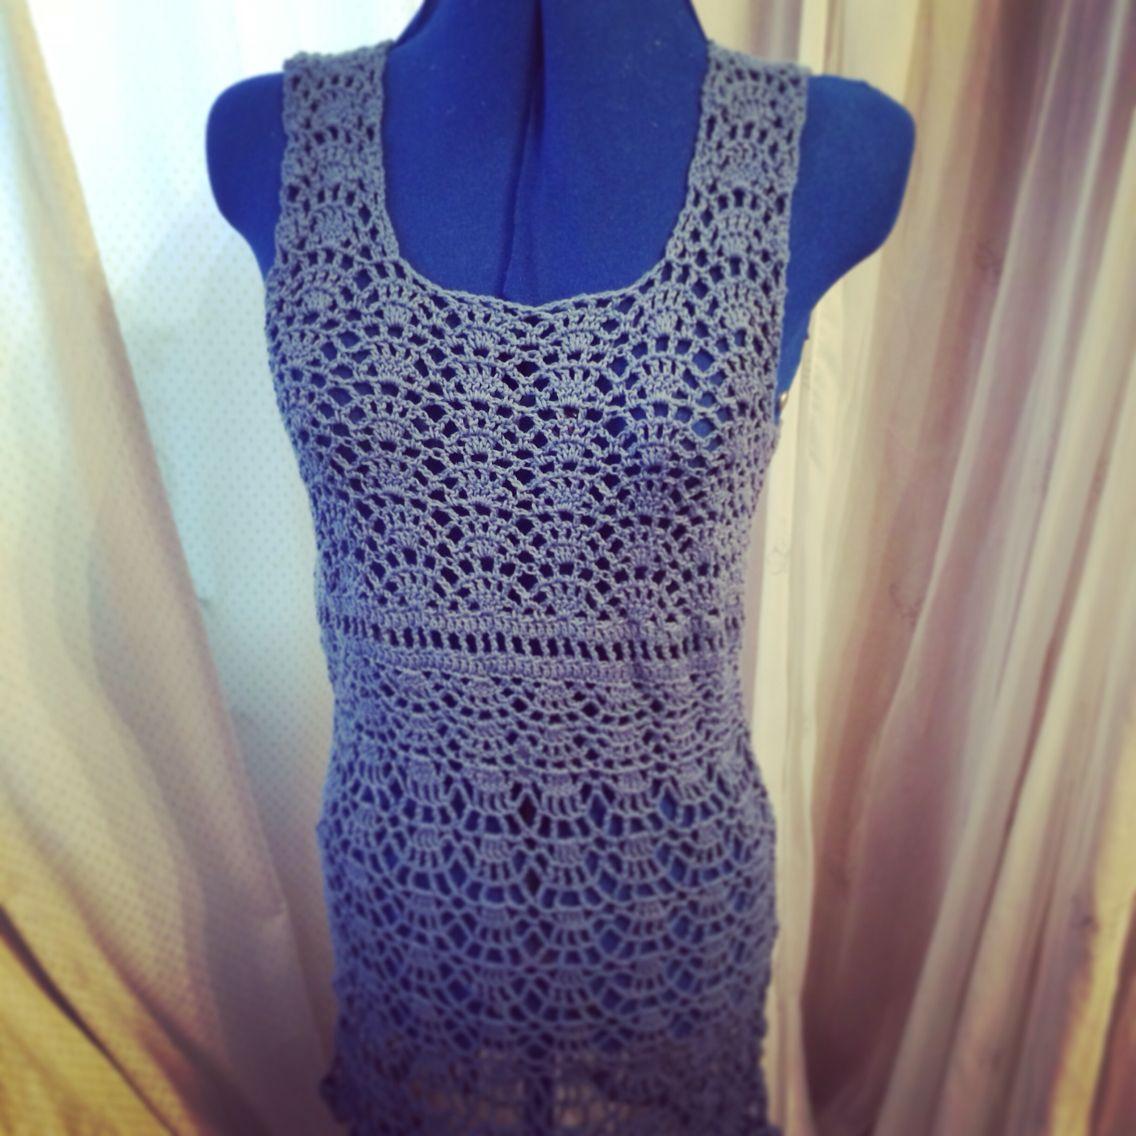 #crochet #dress #shell #crochetshell #hobbies #bristol #ajgardner #etsy #abacusmaximus